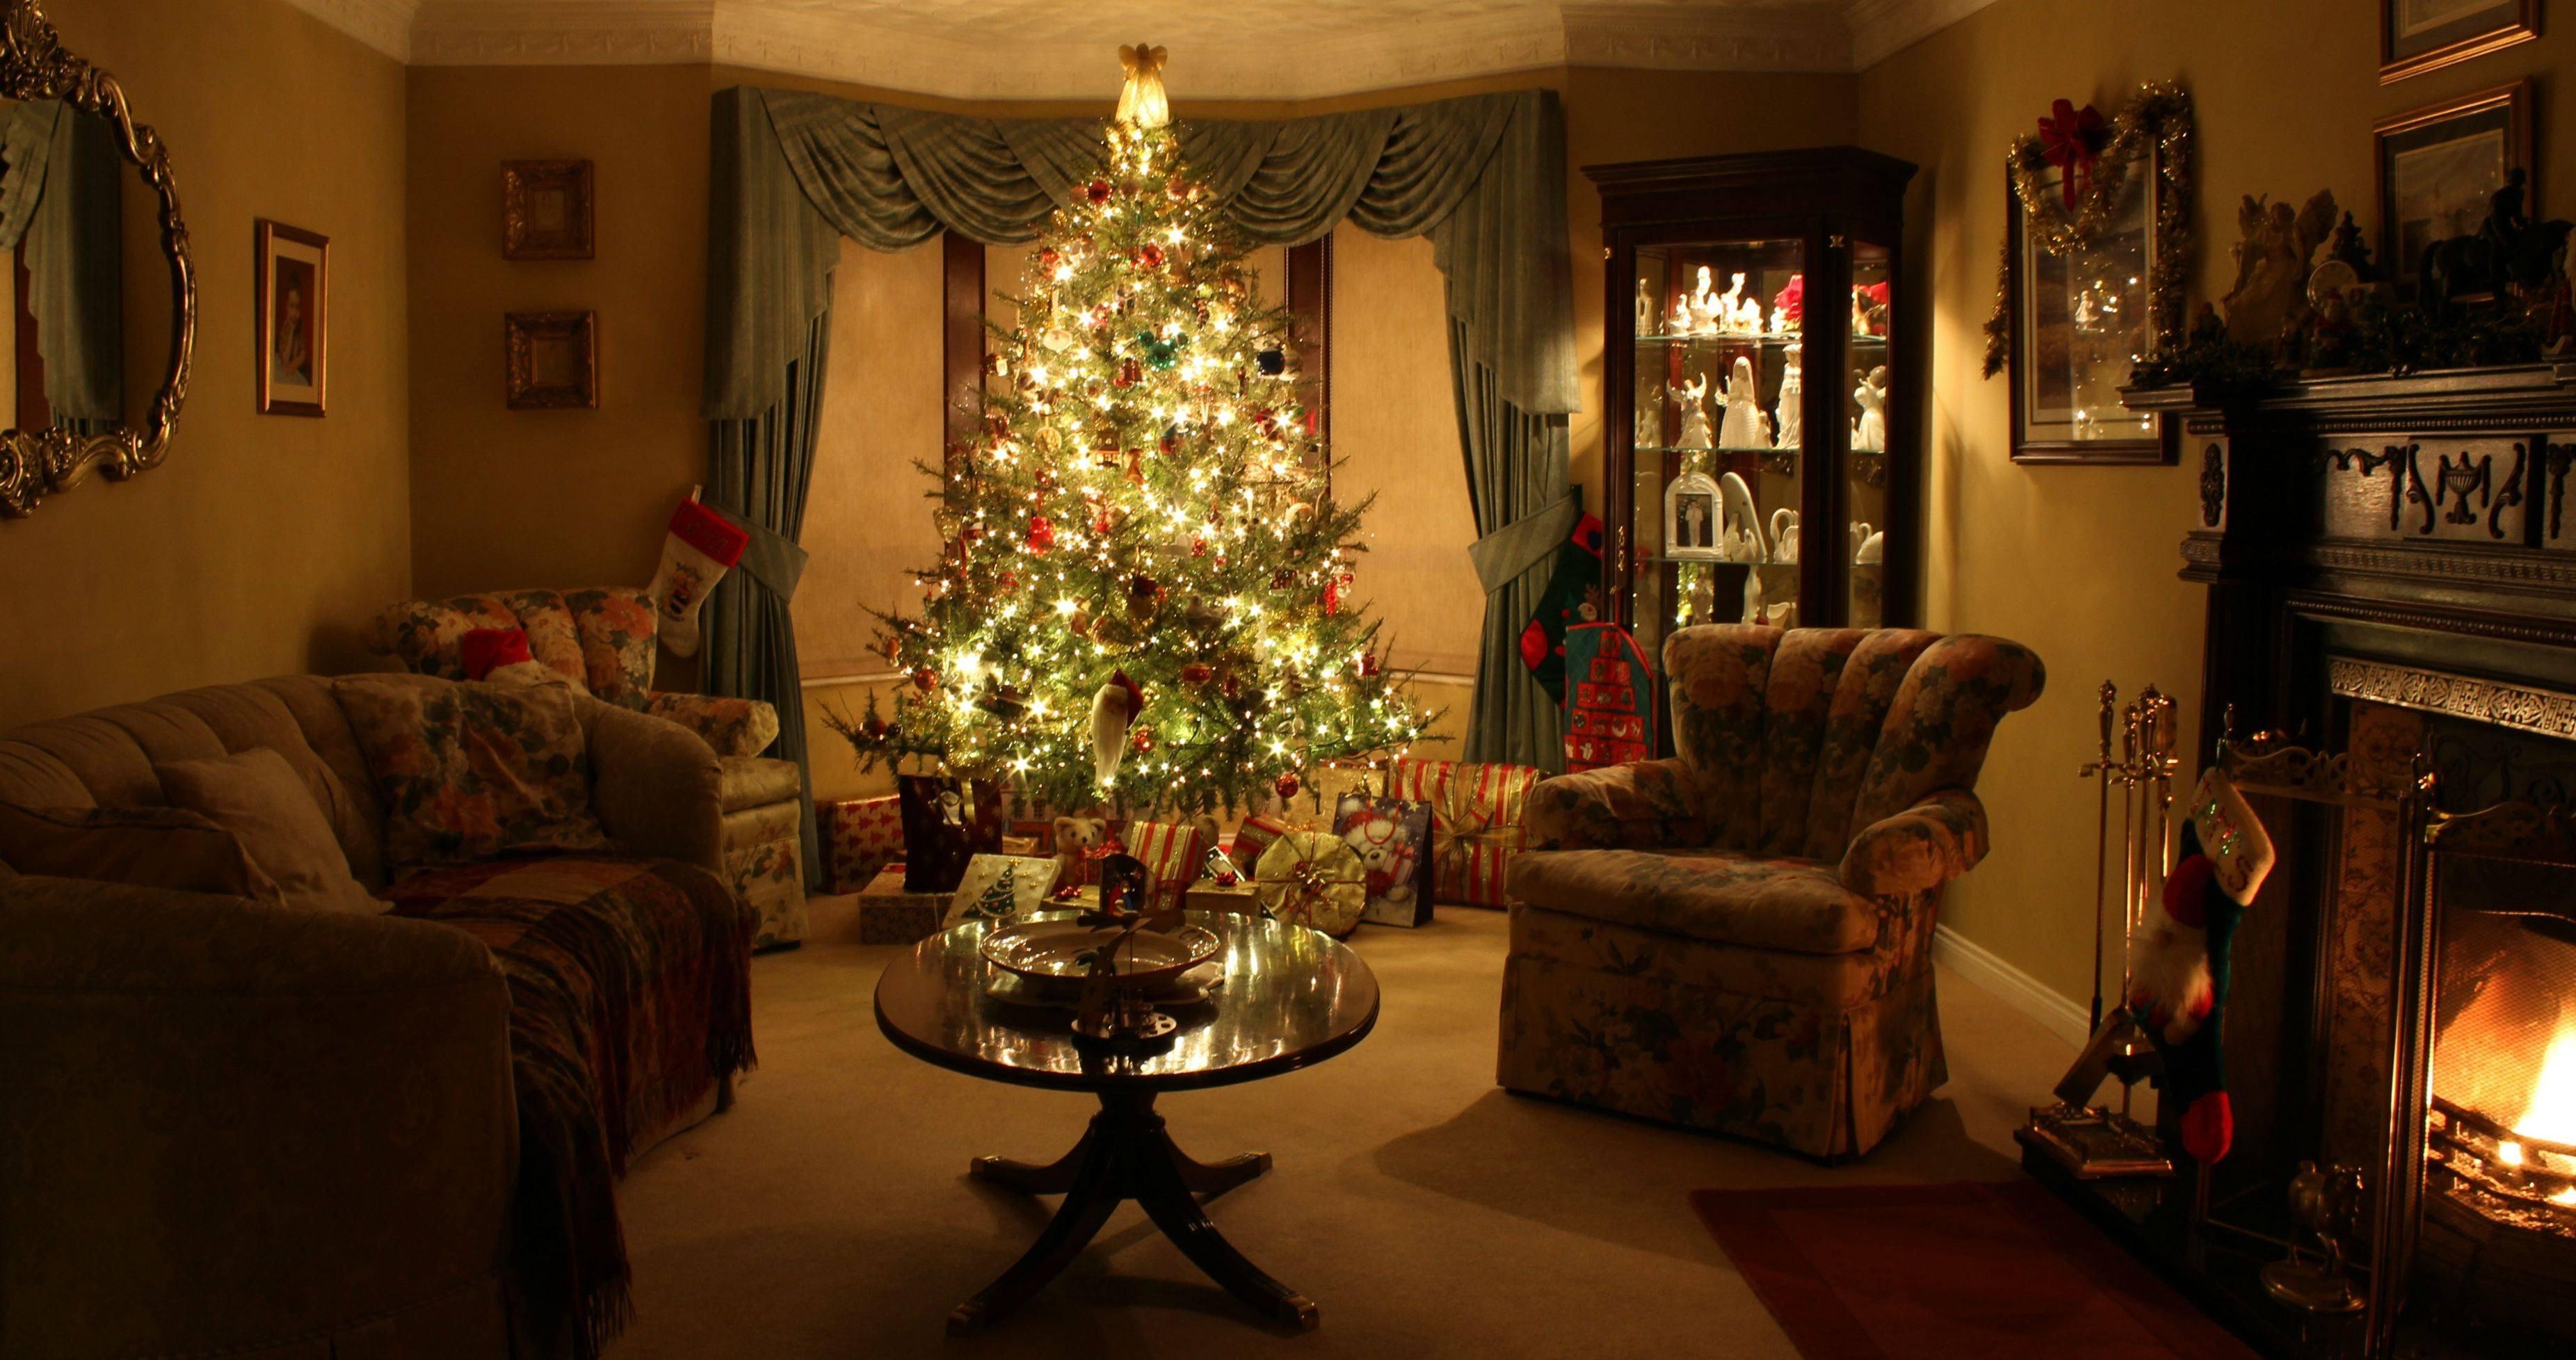 Tree Decor for Living Room Inspirational I Think My Living Room Oozes Christmas if I Say so Myself Pics